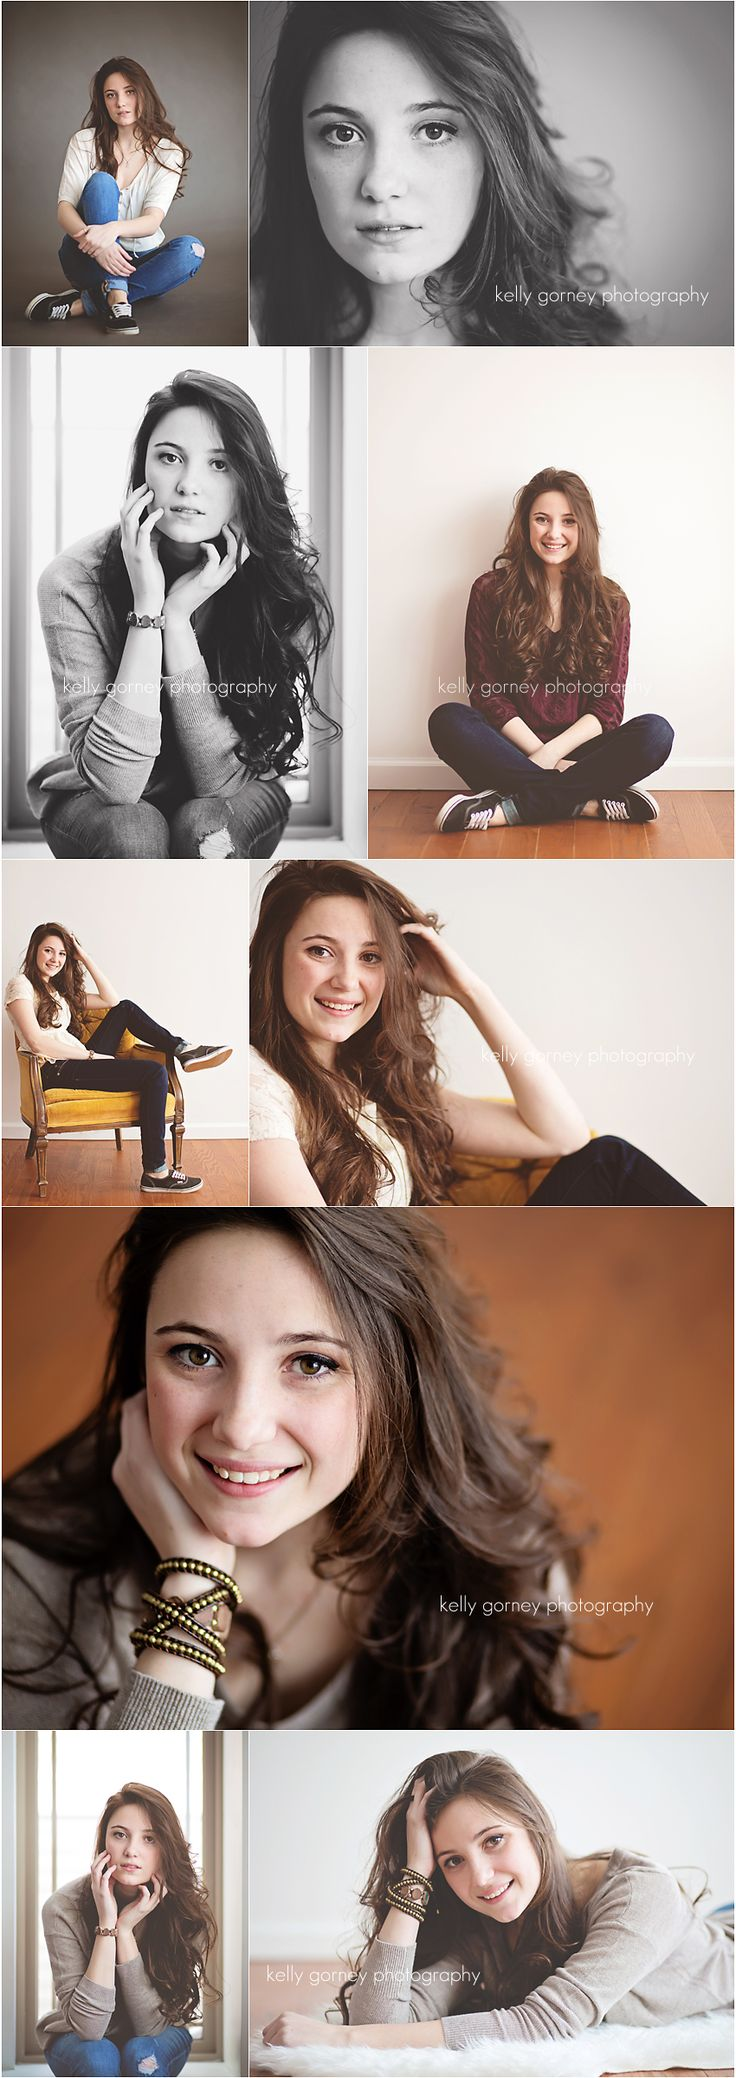 Senior Session | Kelly Gorney Photography Senior Rep